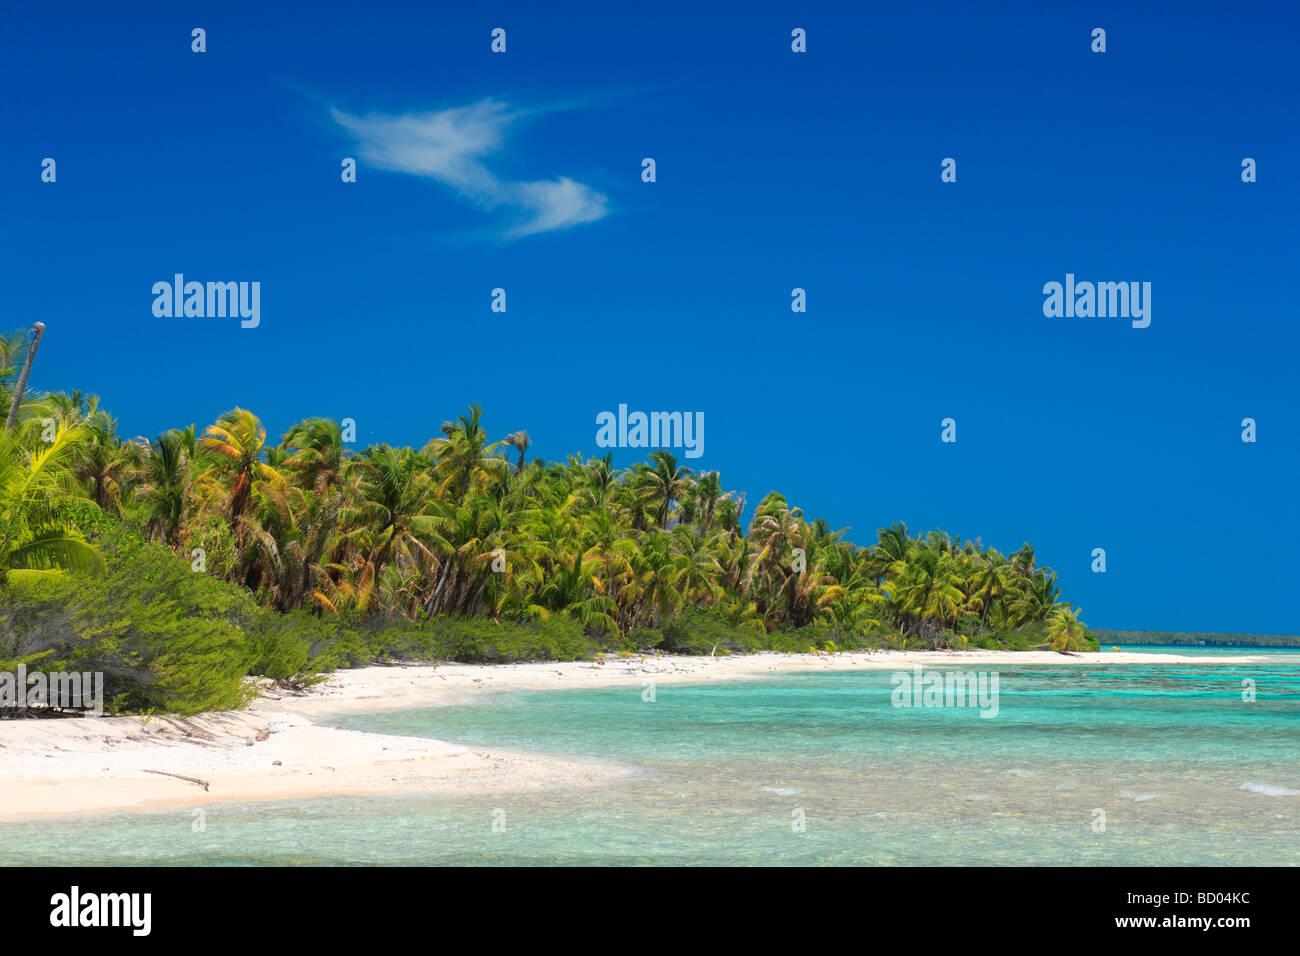 Rangiroa coastline, Tuamotu Archipelago, French Polynesia - Stock Image